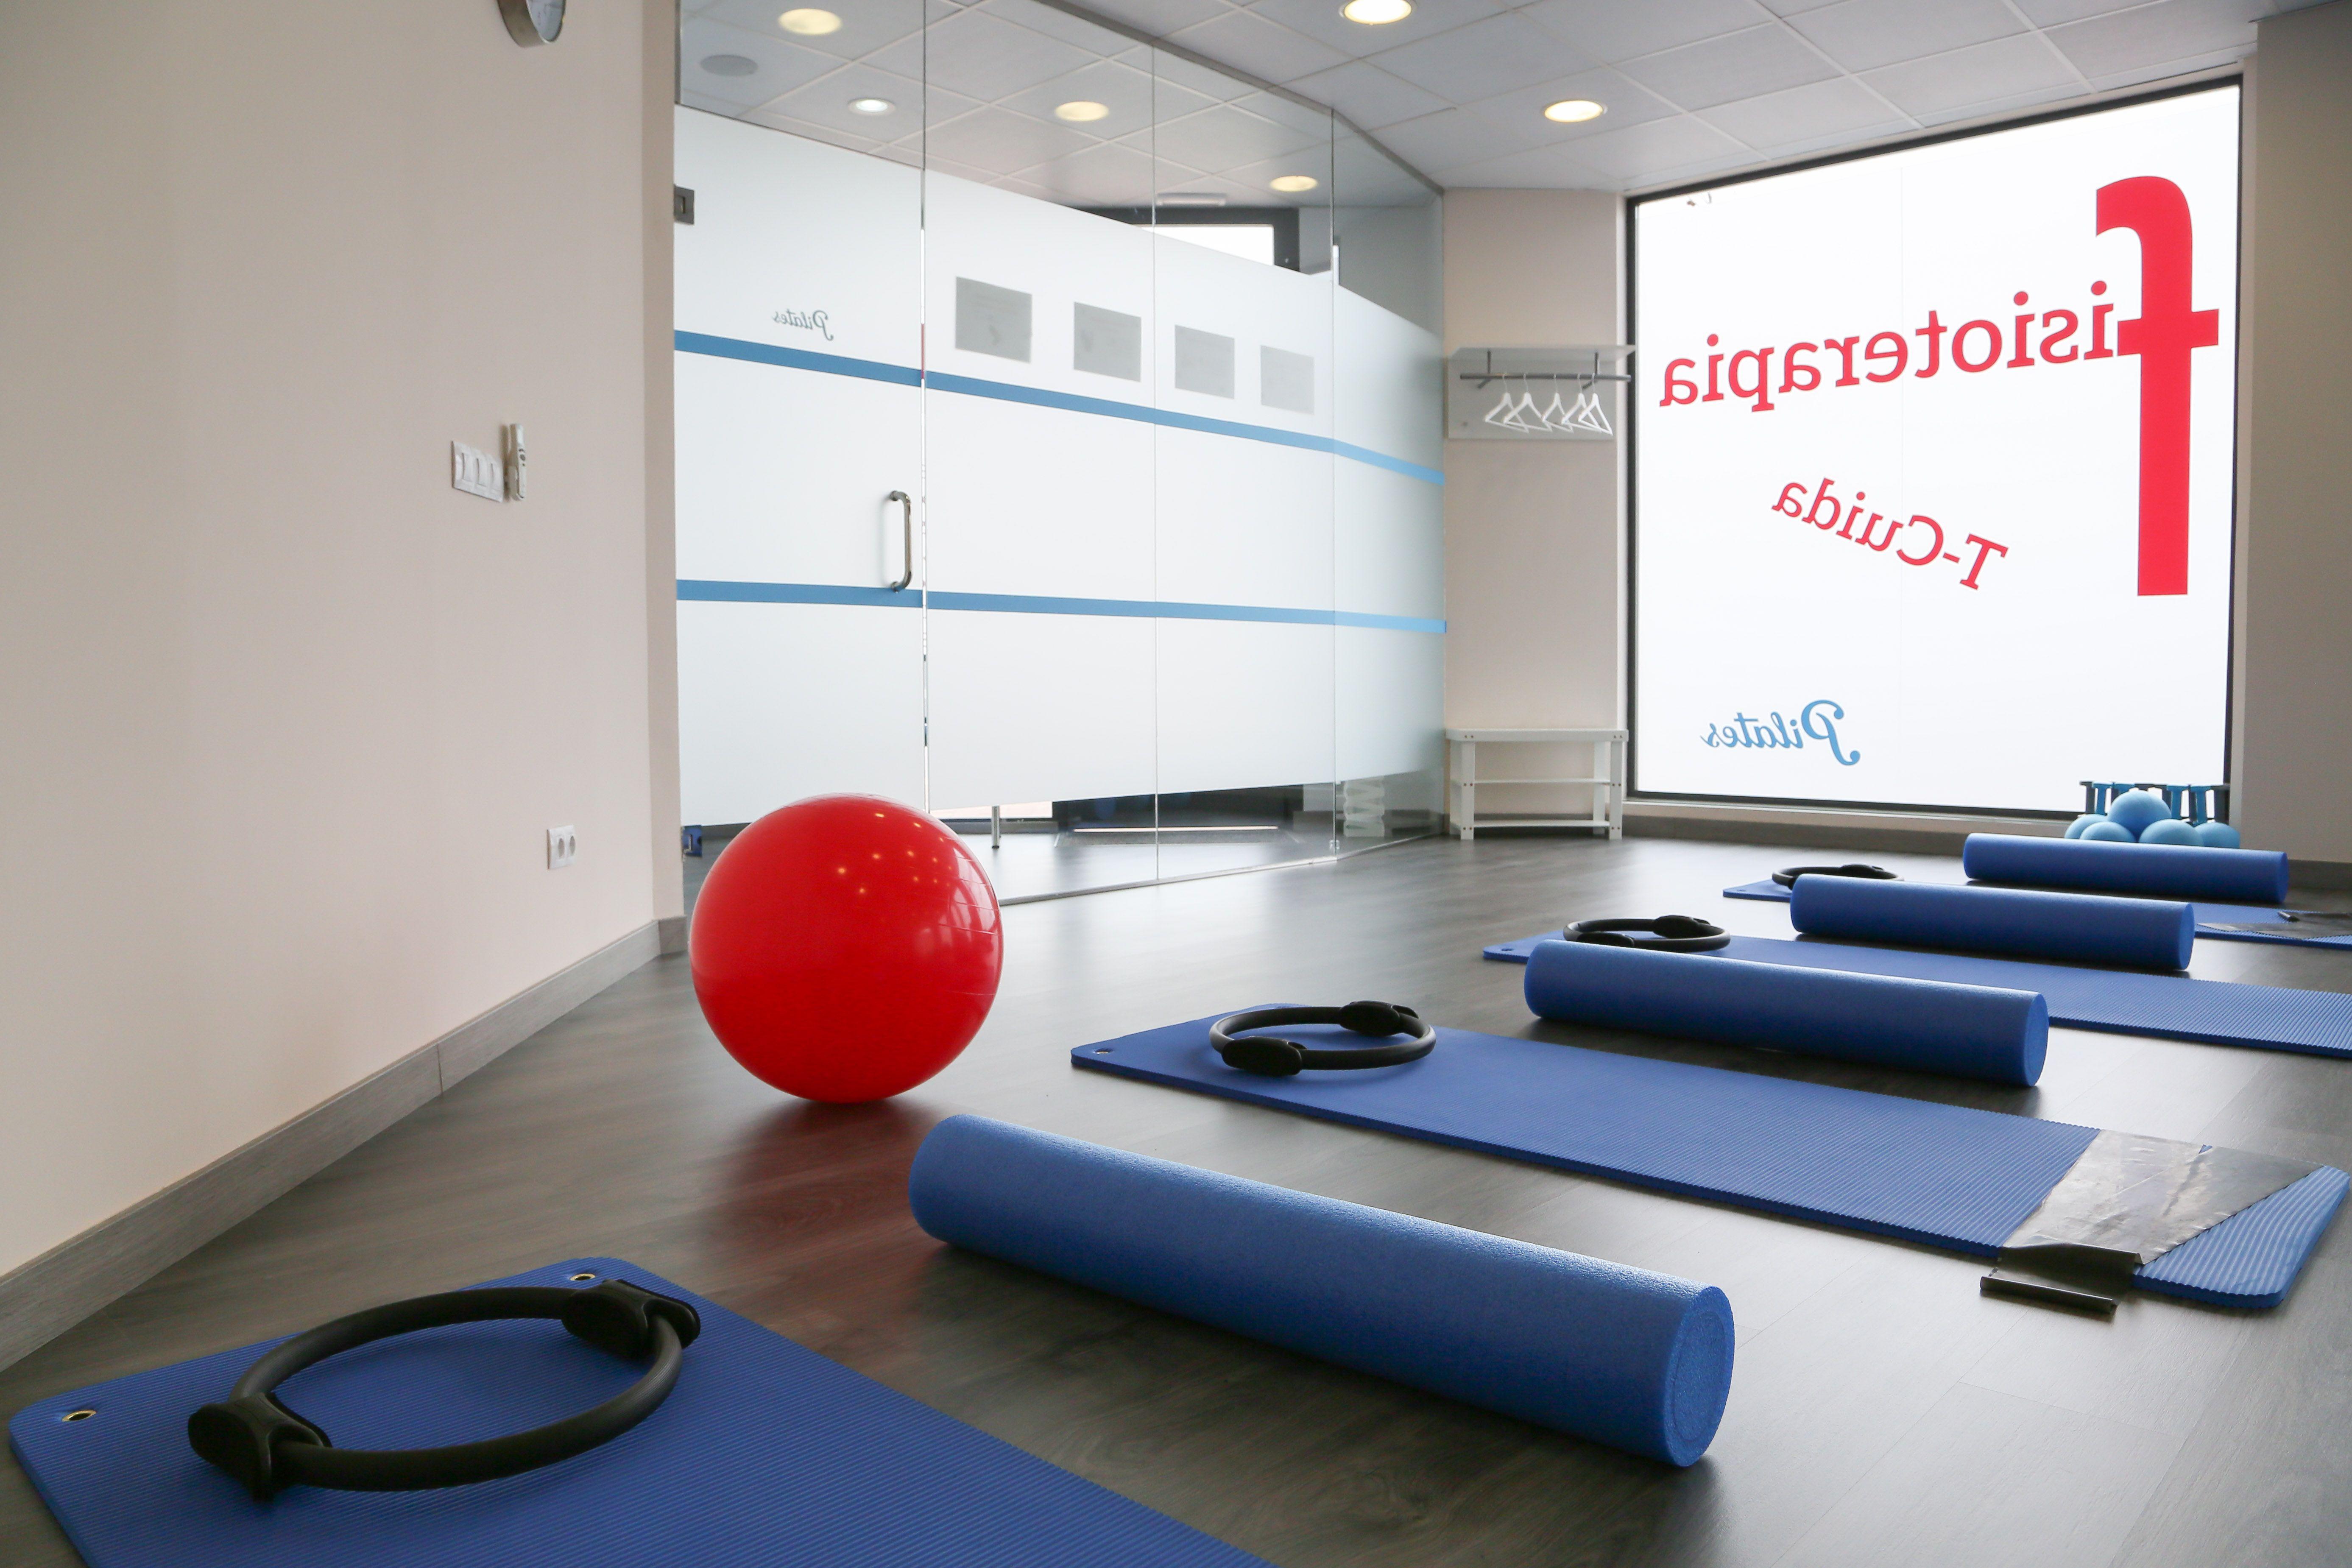 Foto 1 de Fisioterapia en Madrid | Fisioterapia T-Cuida